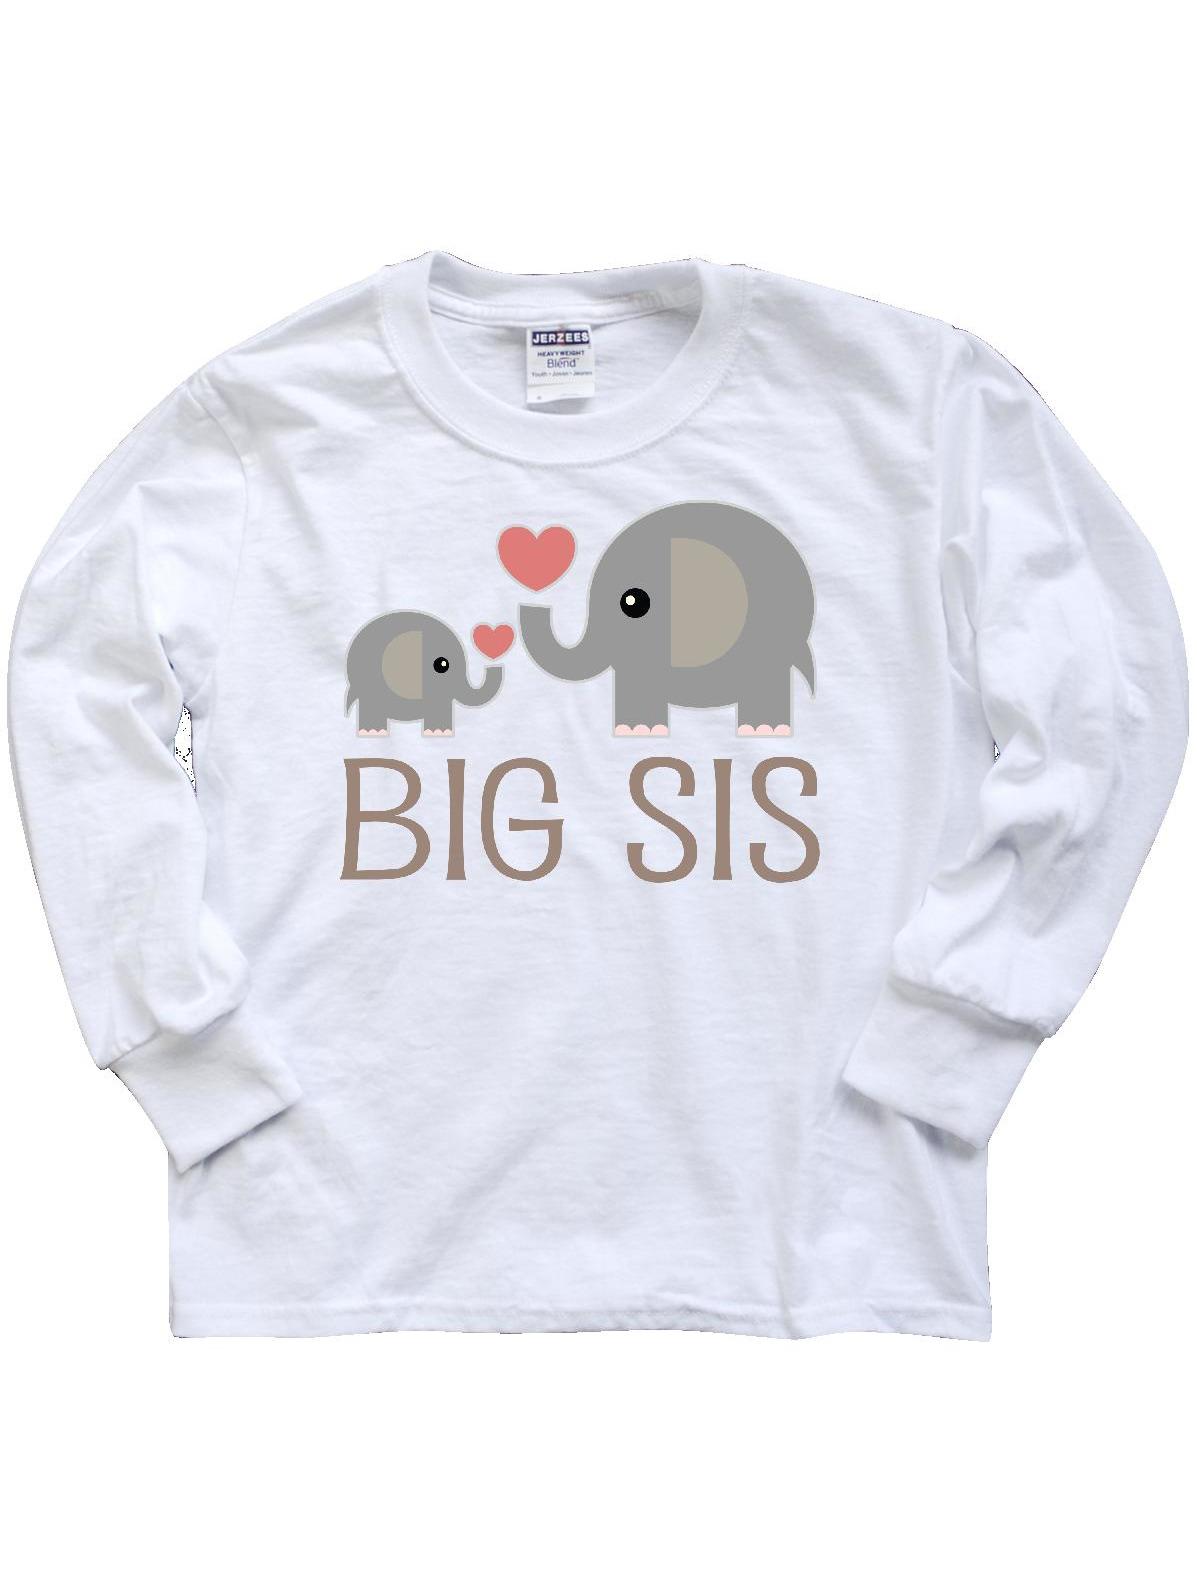 Big Sis Elephant Youth Long Sleeve T-Shirt